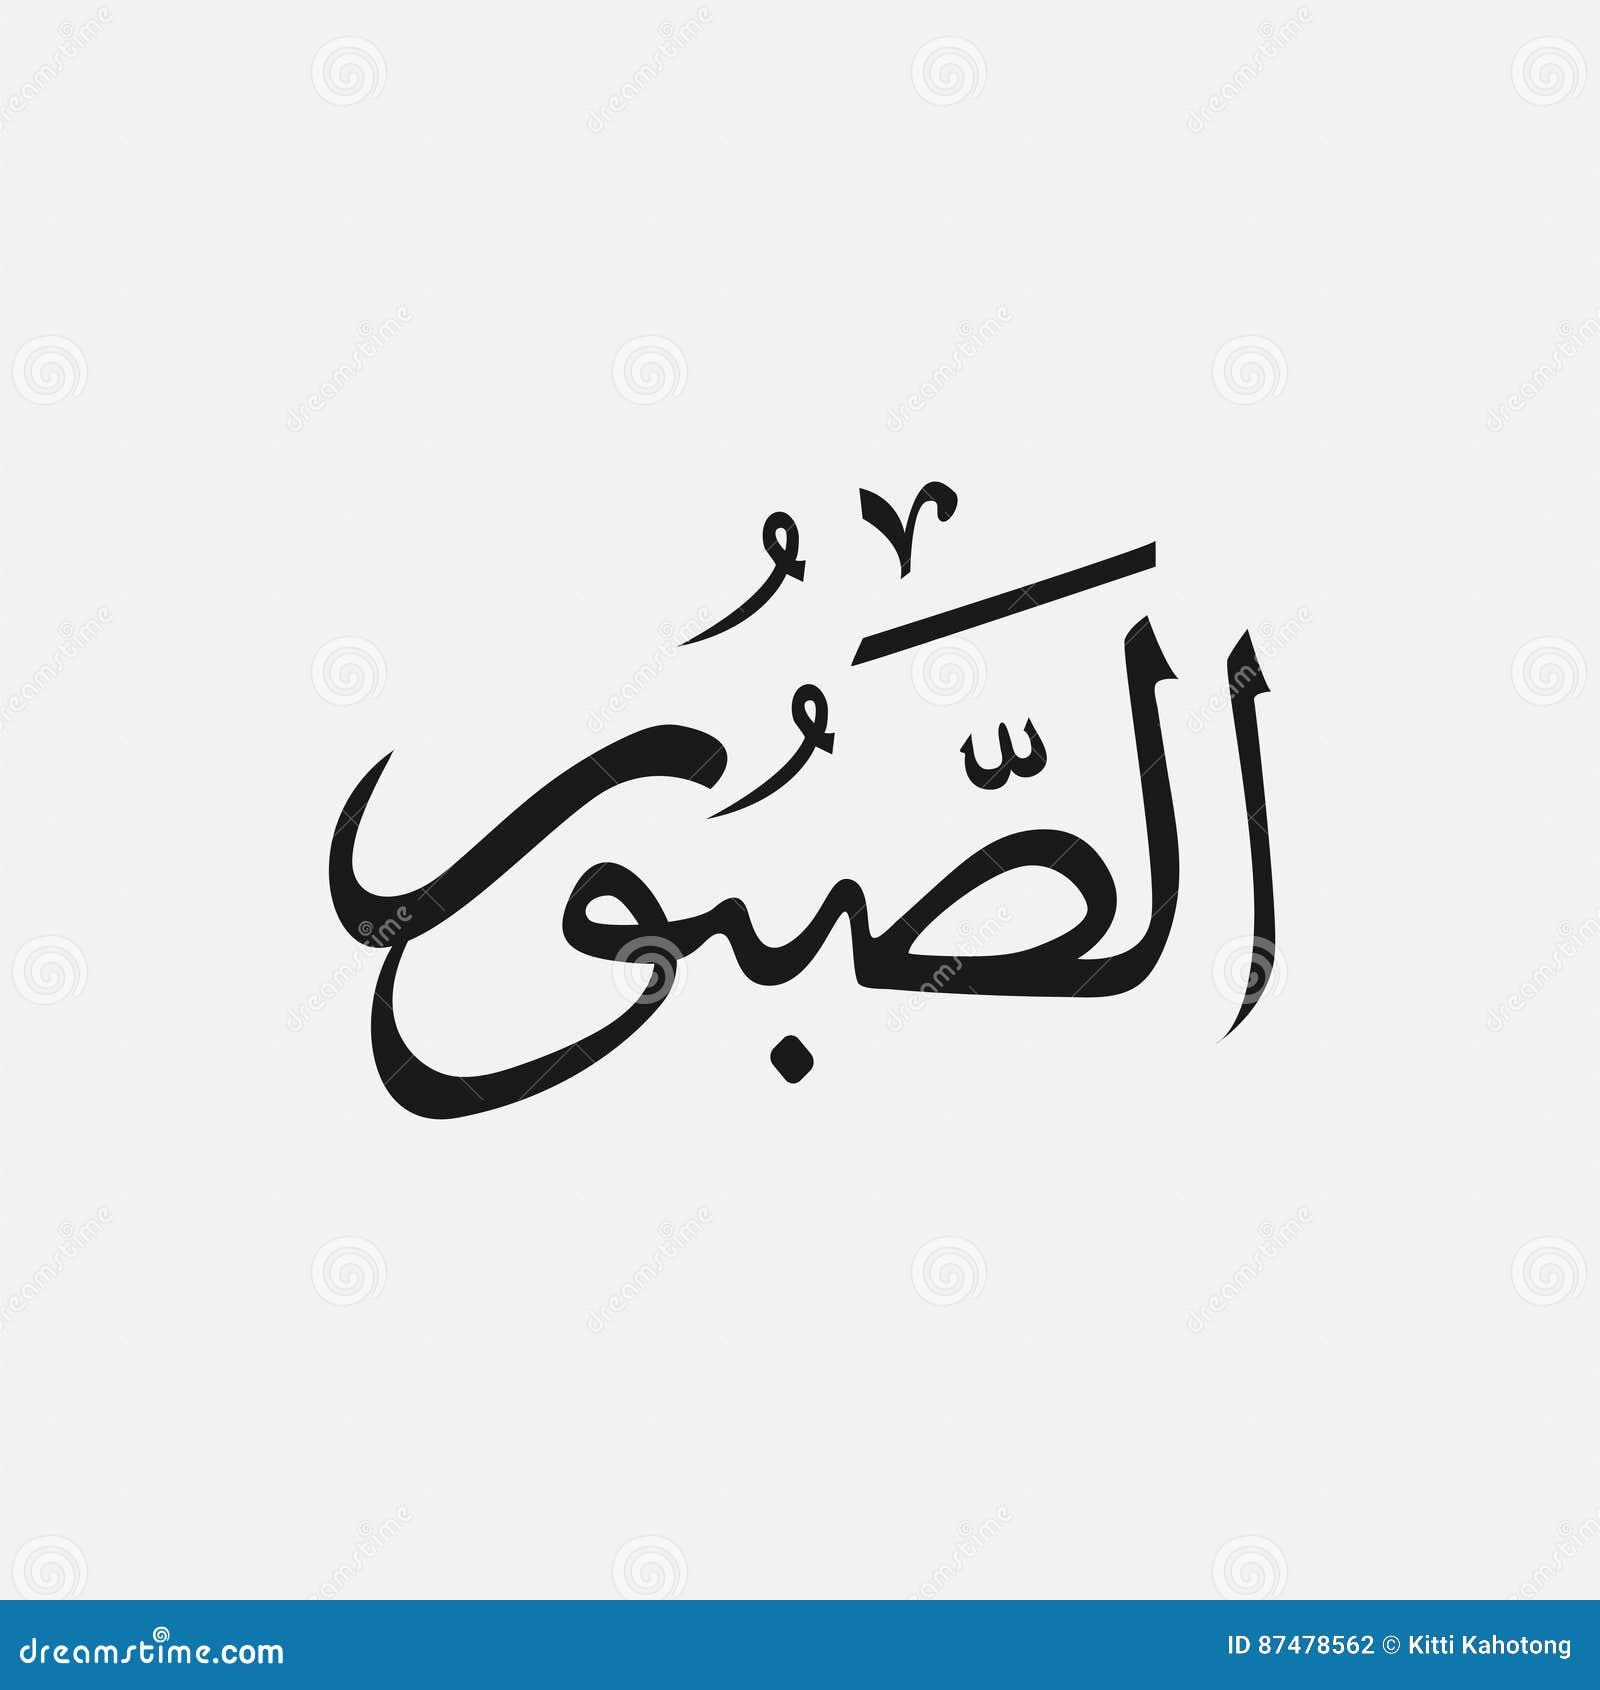 Essay on service quran in arabic